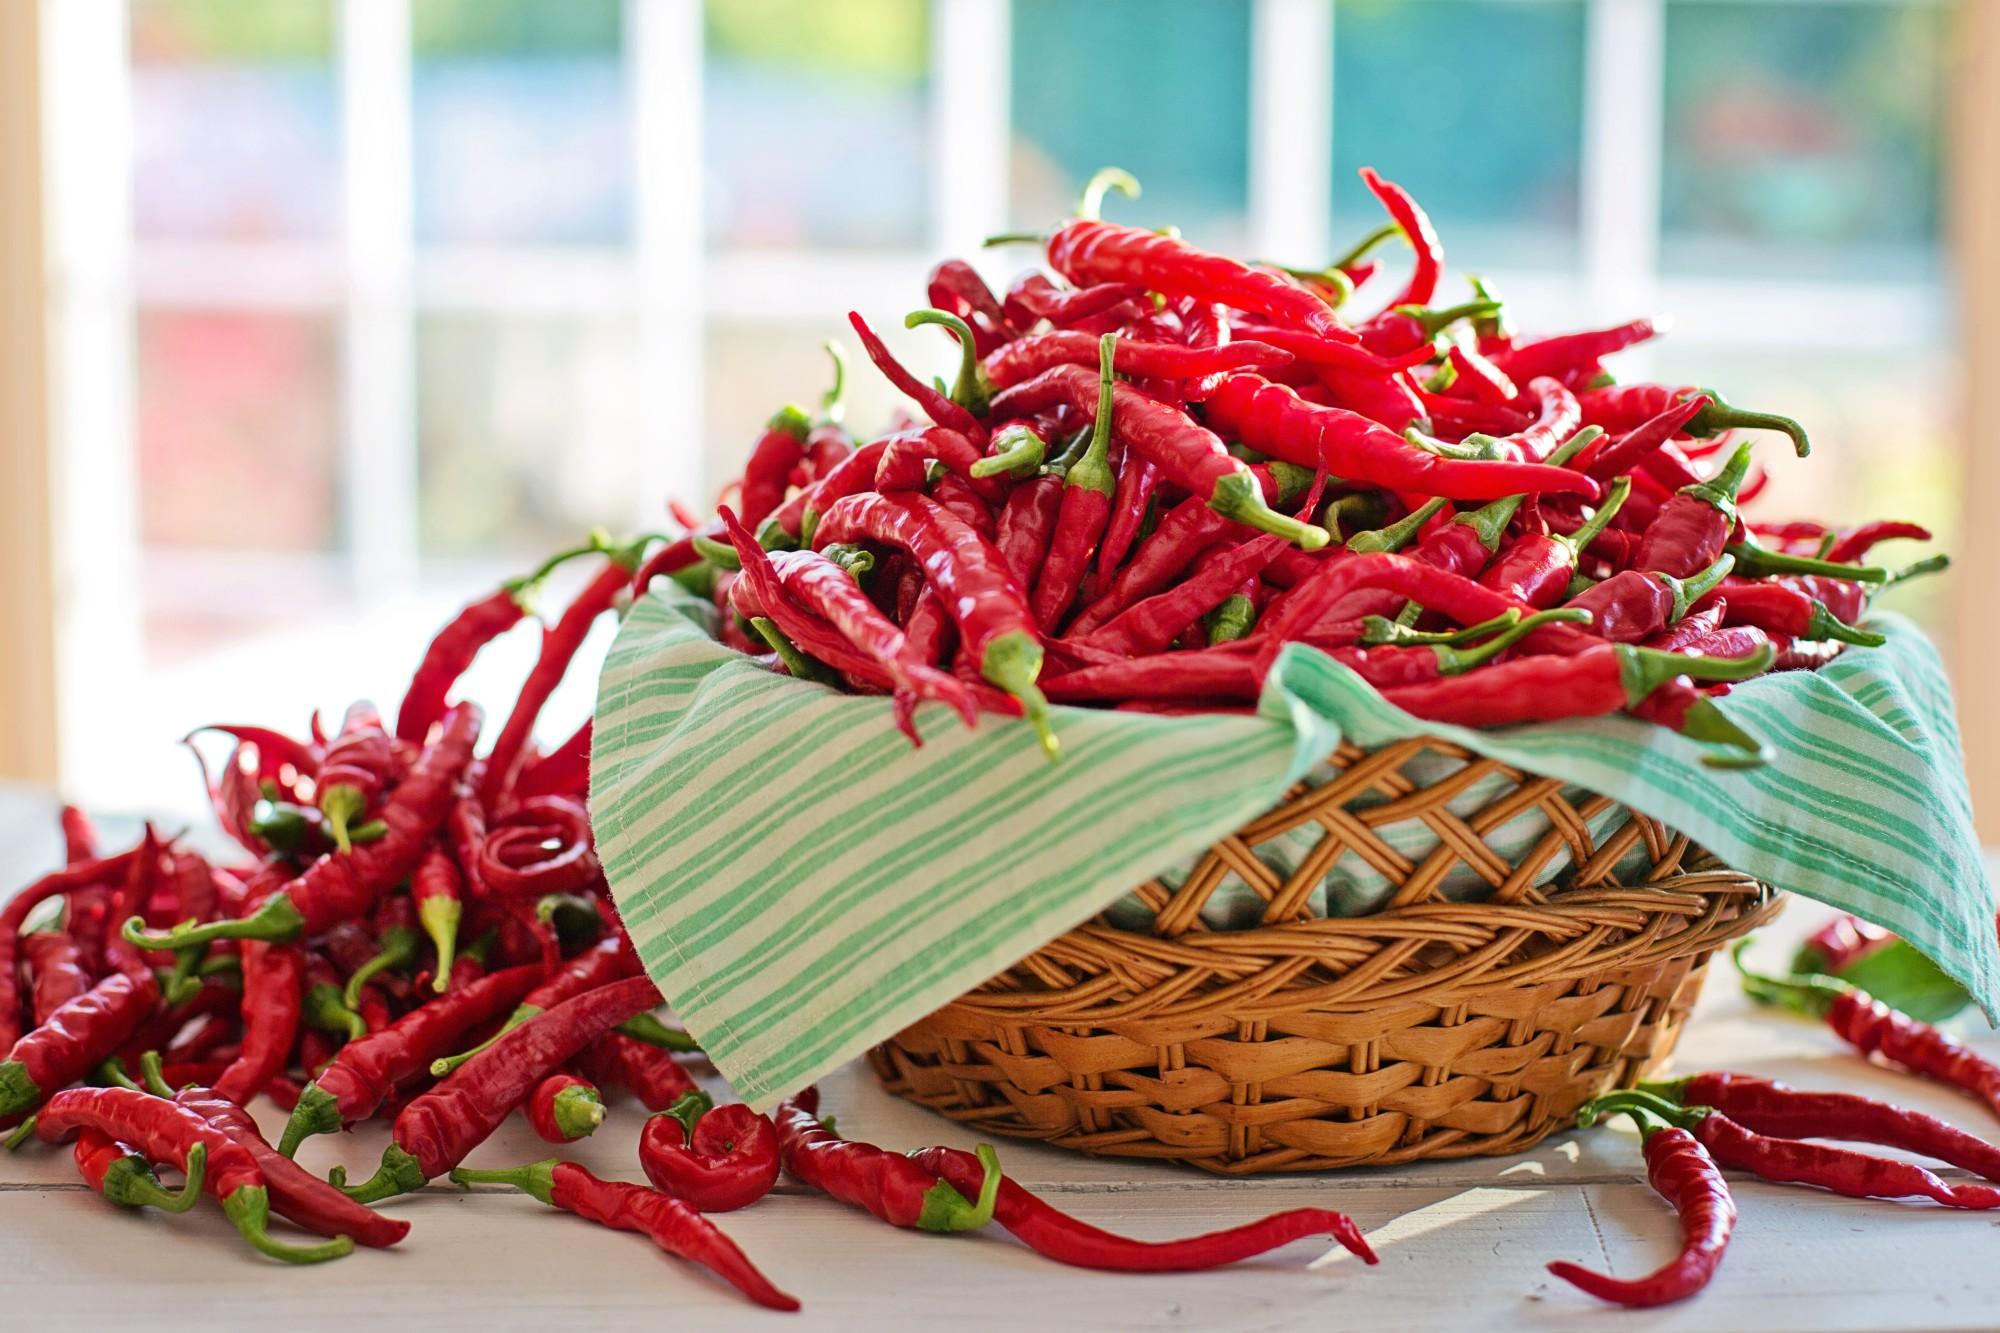 5 Key Health Benefits of Using Cayenne Pepper